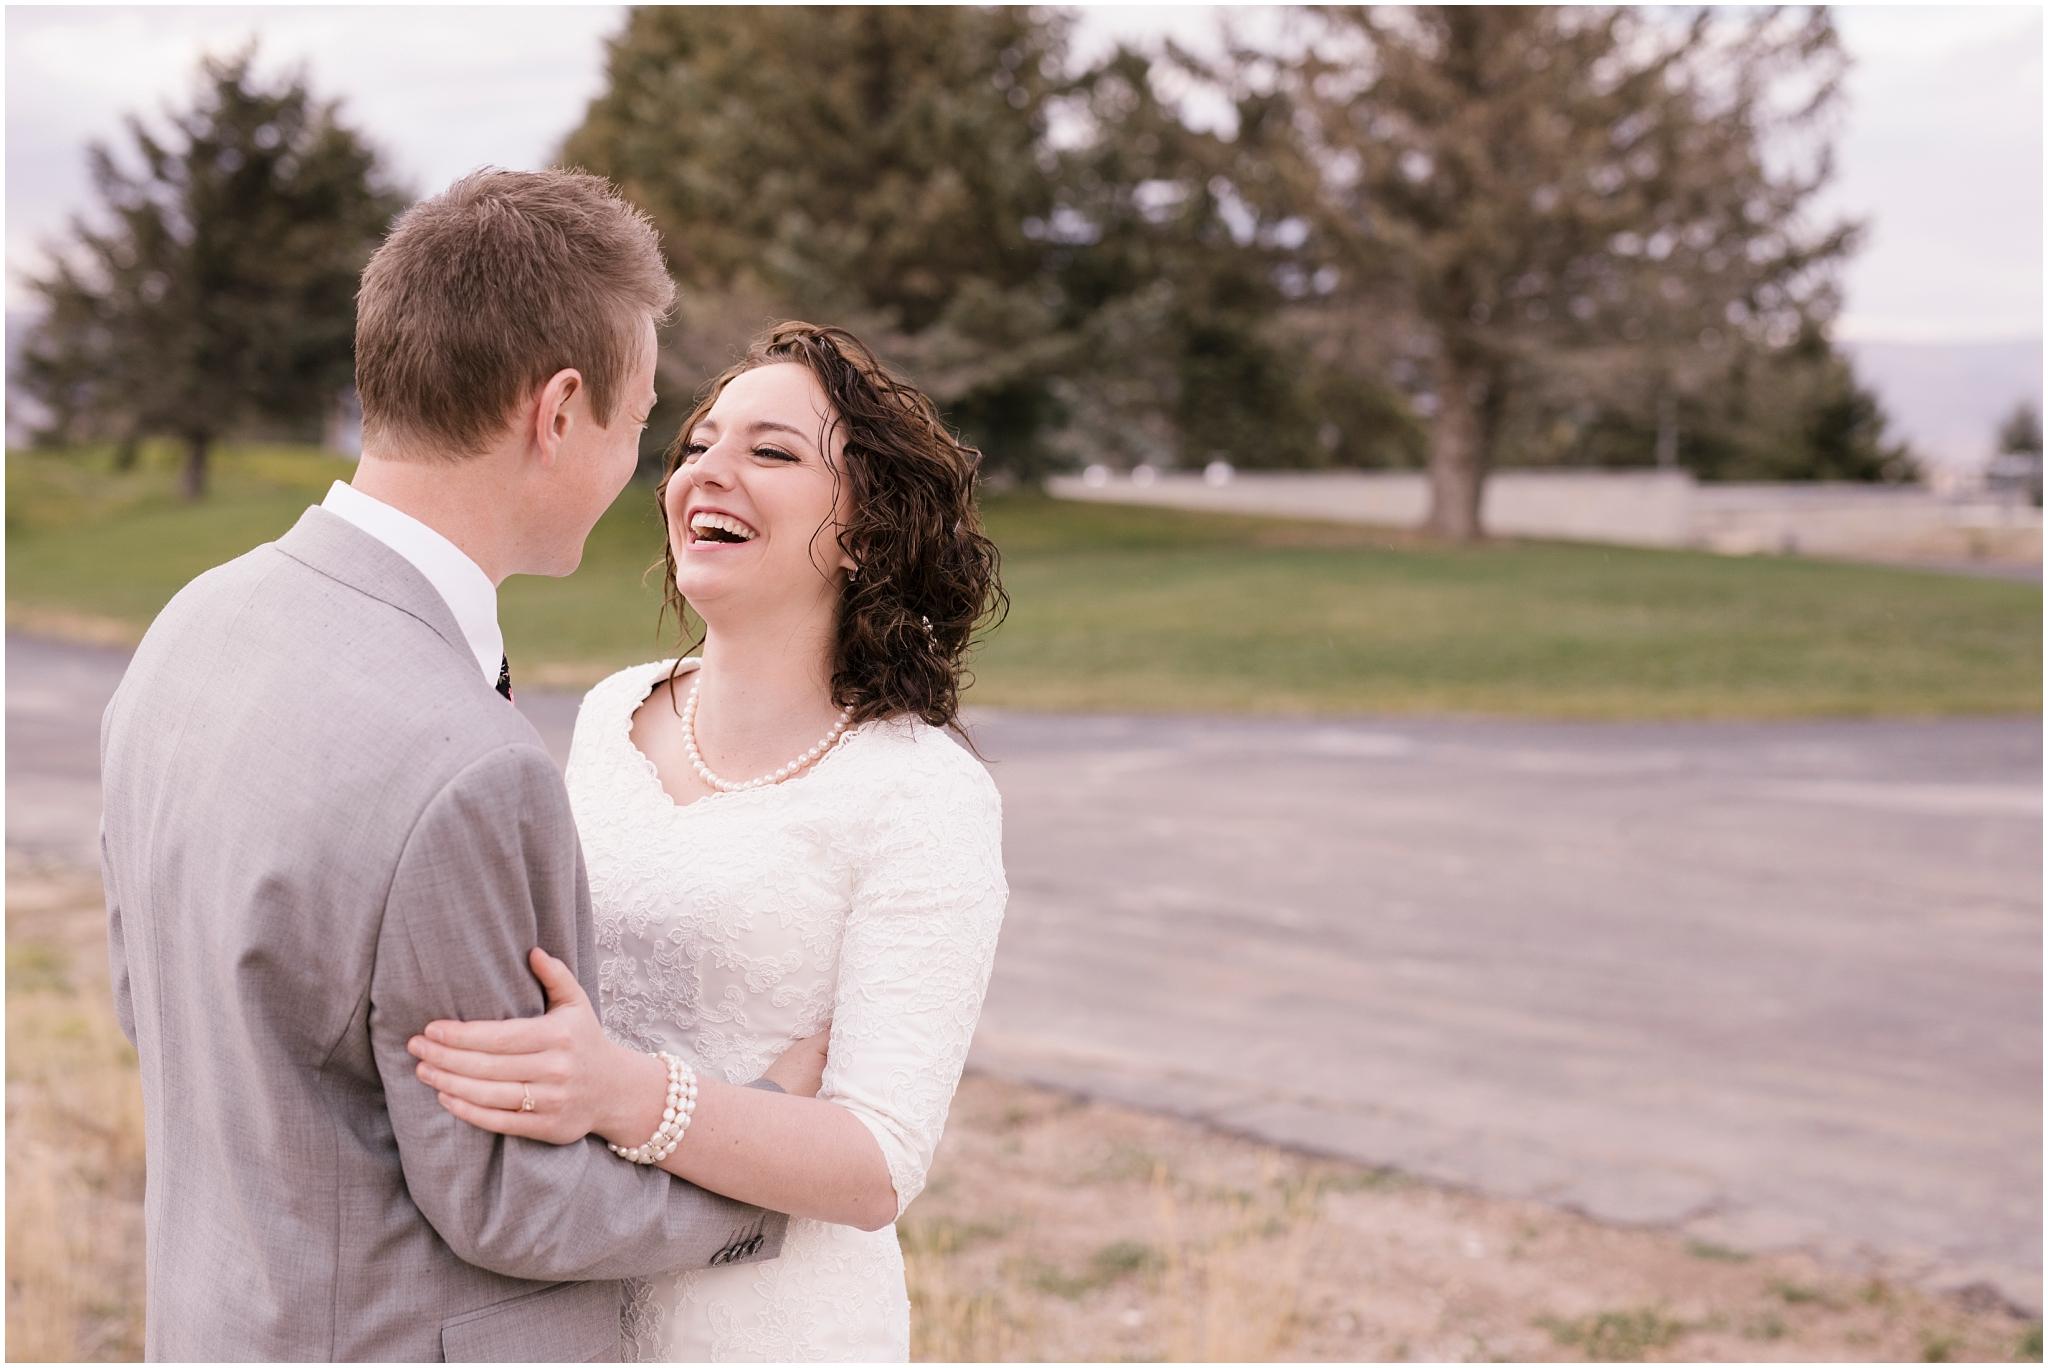 BA-Bridals-70_Lizzie-B-Imagery-Utah-Wedding-Photographer-Central-Utah-Photographer-Utah-County-Manti-Utah-Temple.jpg